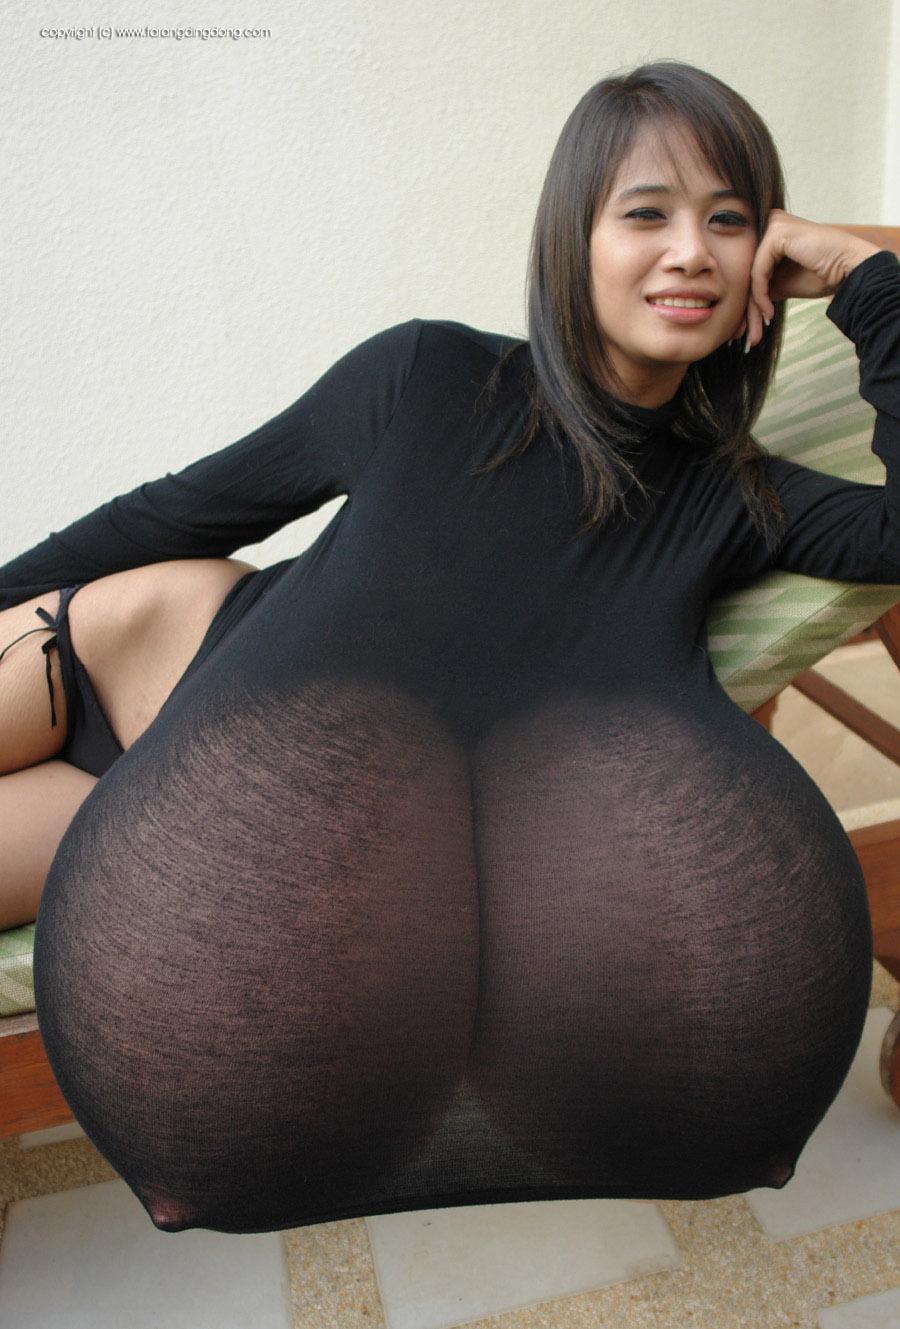 For penis strange girls tits twin